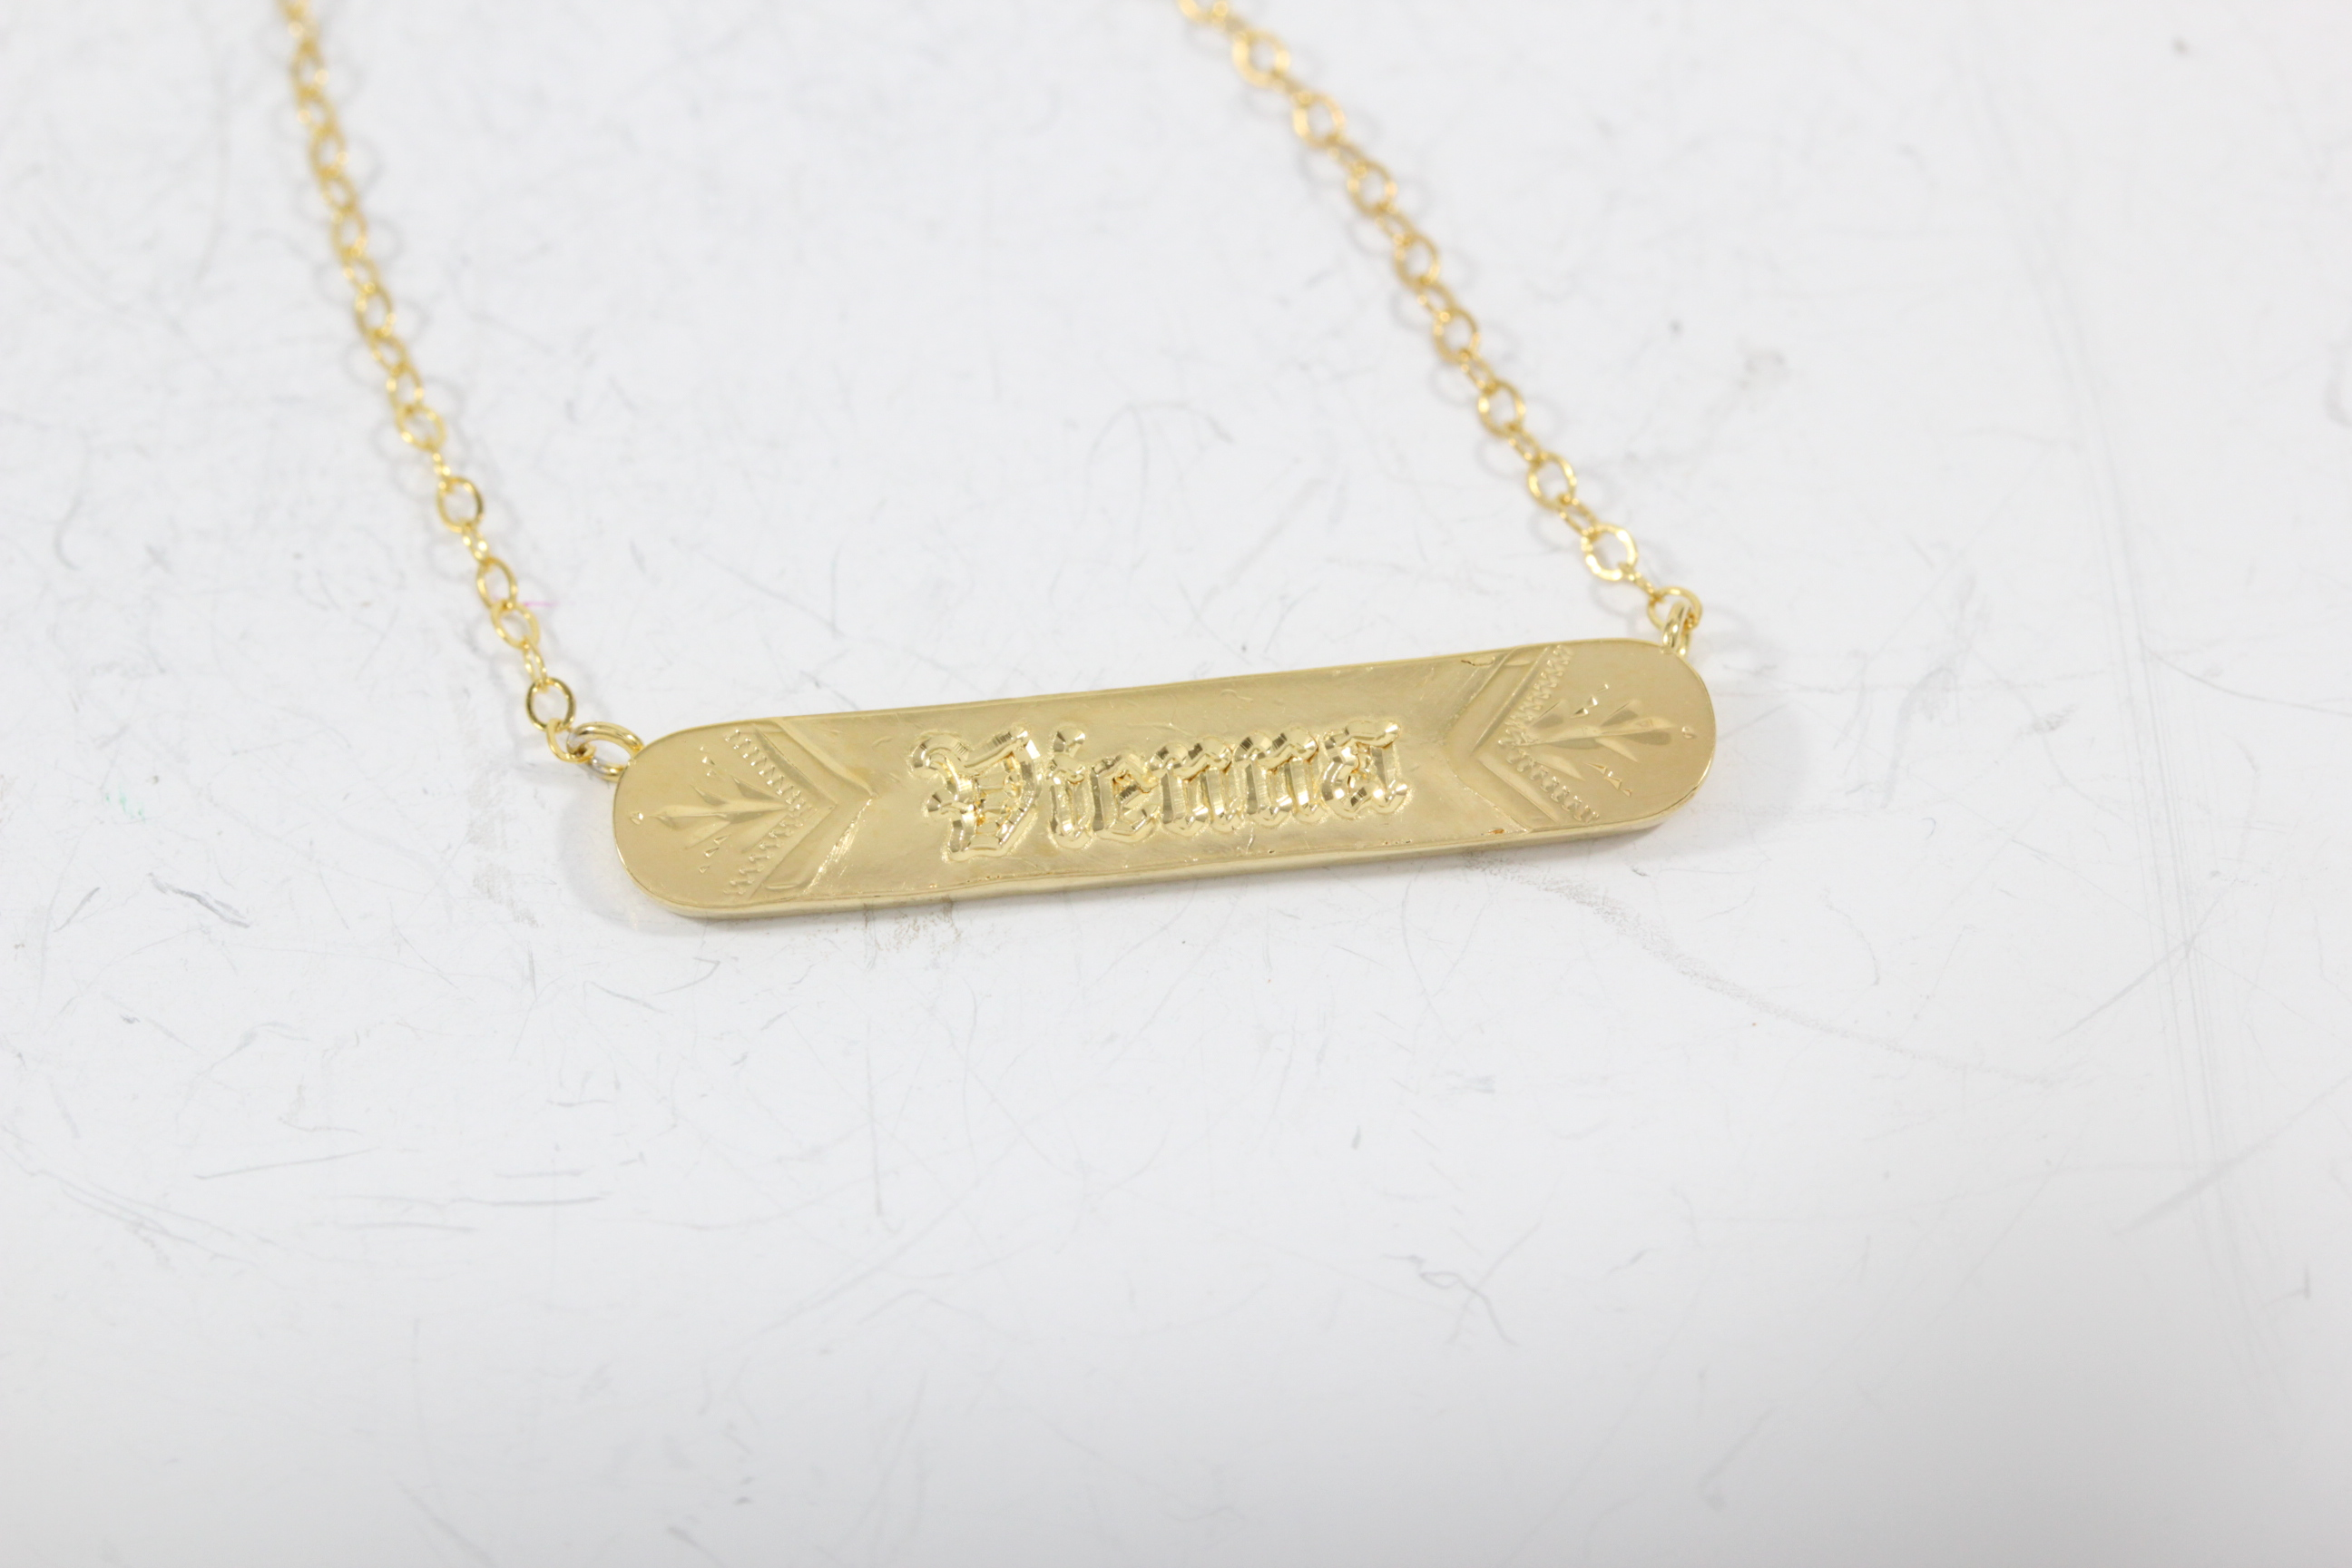 clean-jewelry-box-pendant